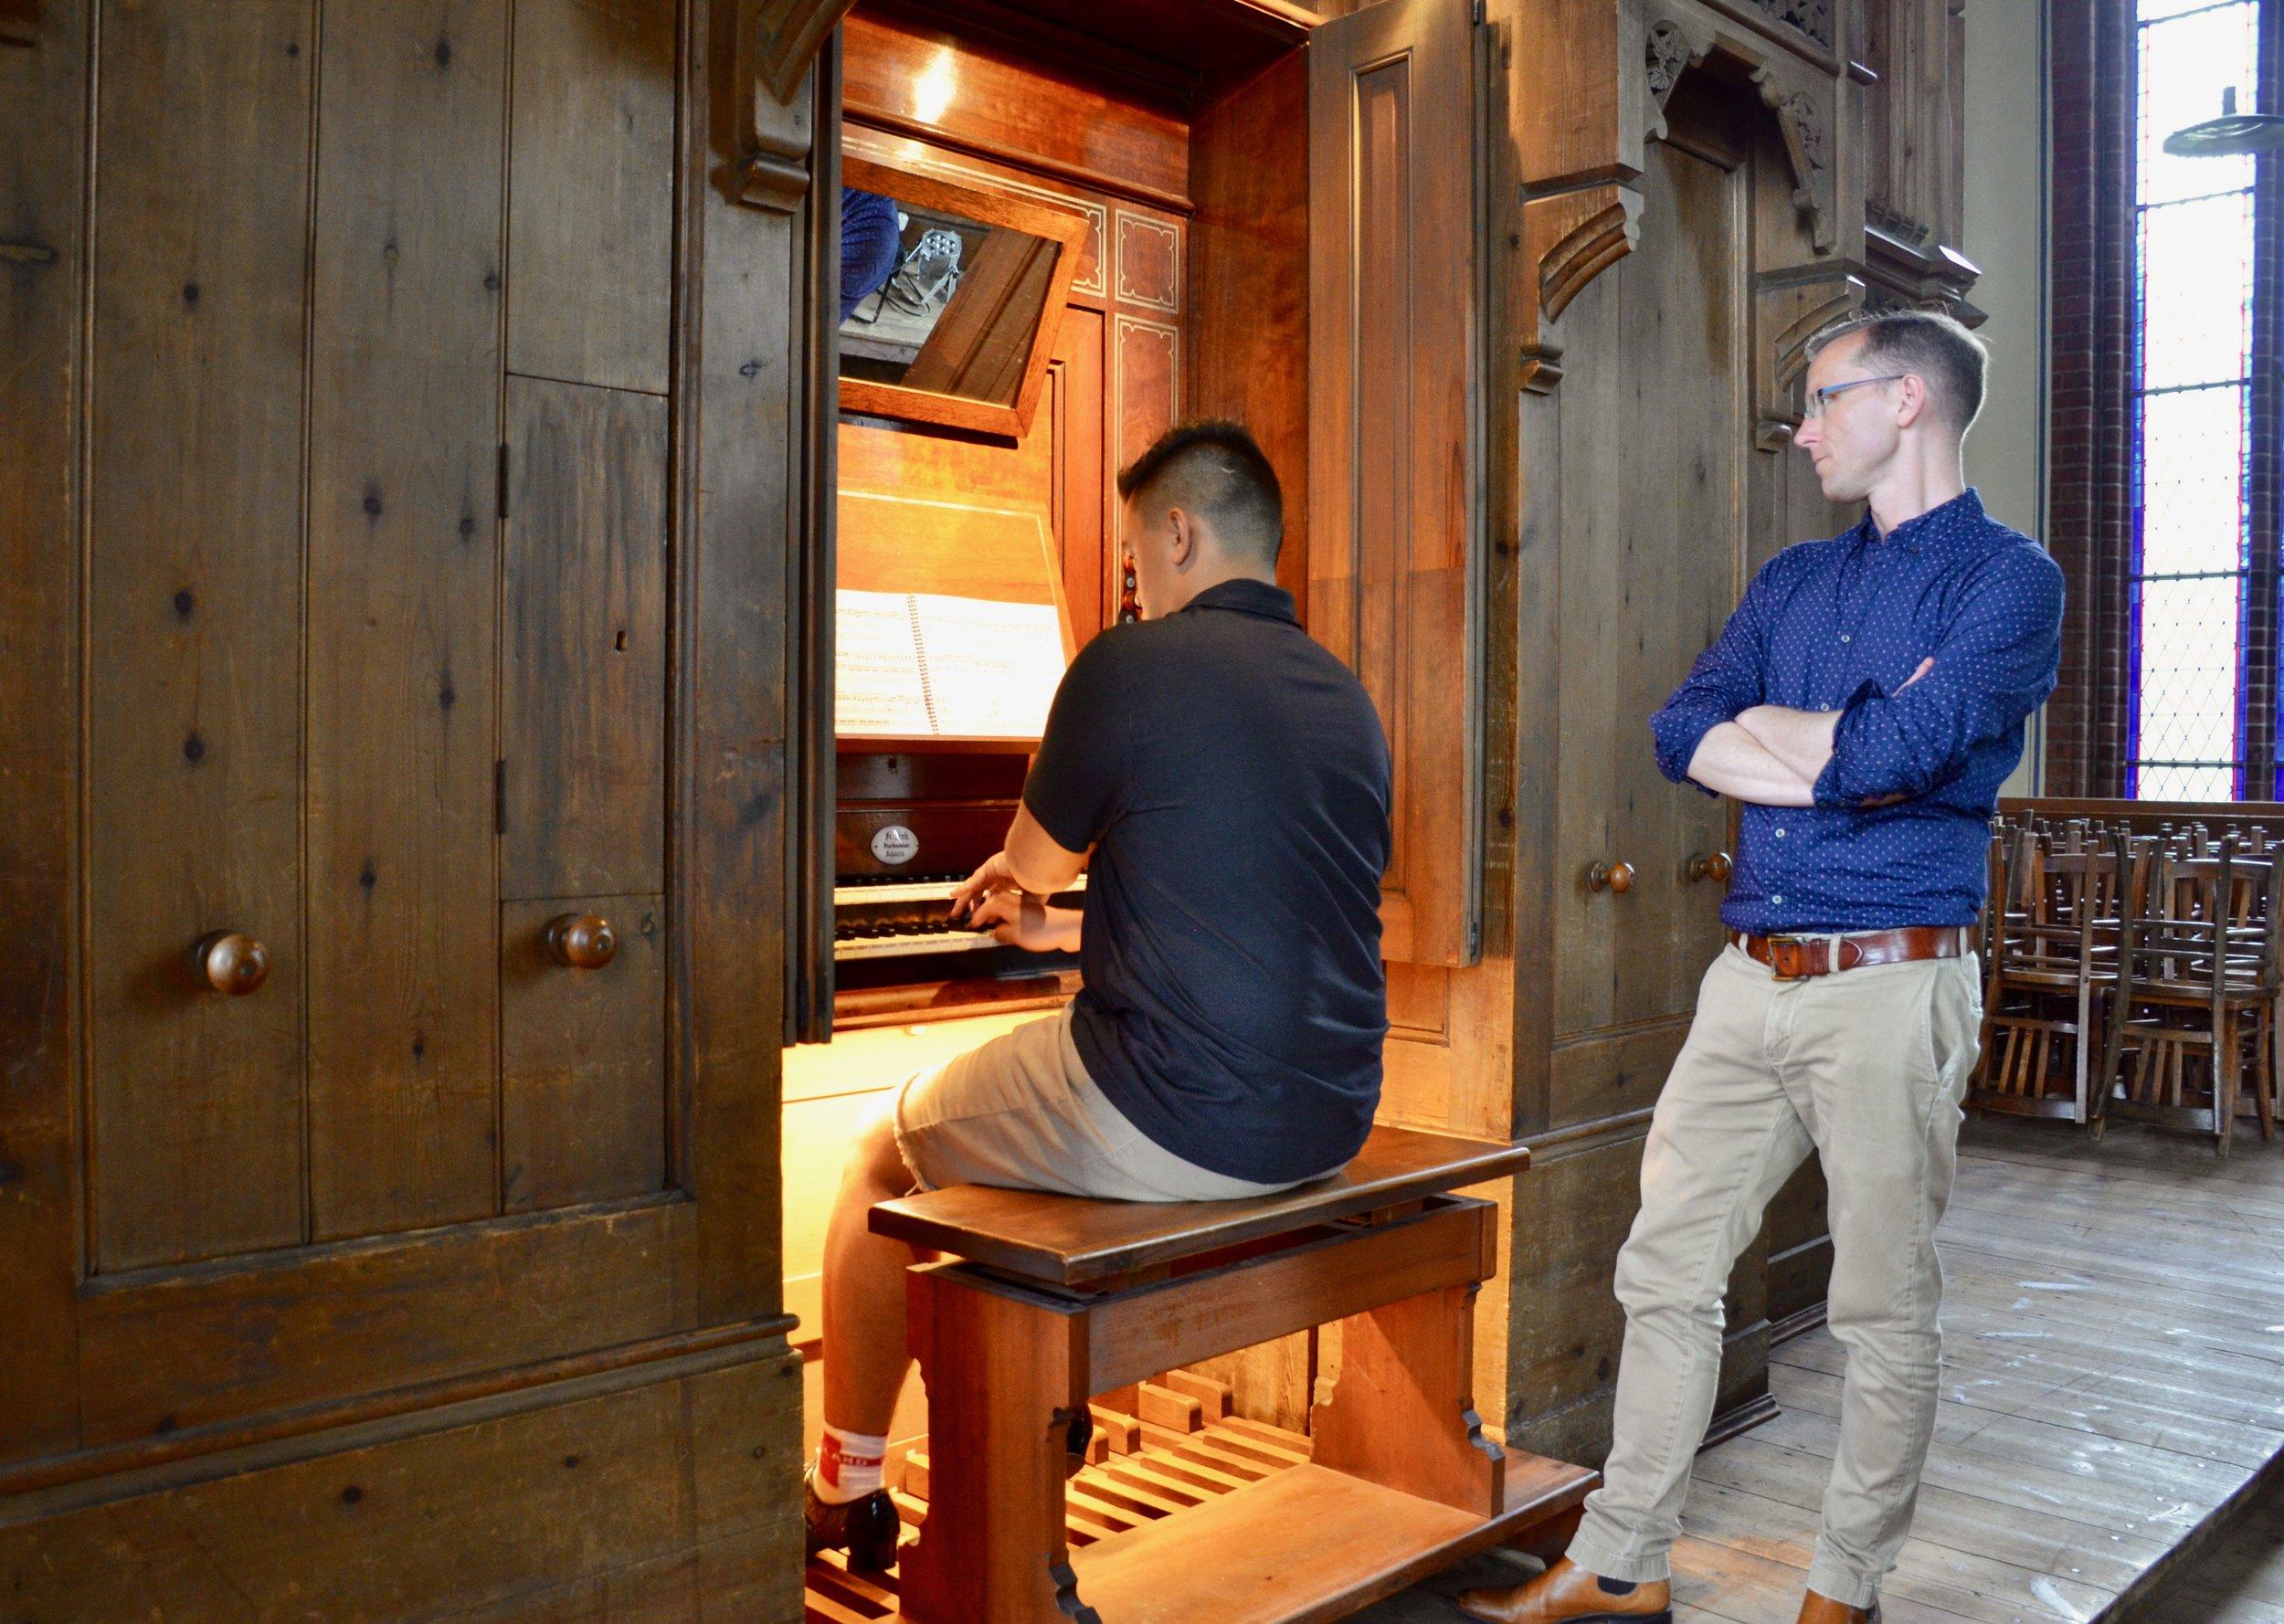 Alexander Straus-Fausto plays 1869 Friese organ, Paulskirche, Schwerin. Boston Organ Studio.